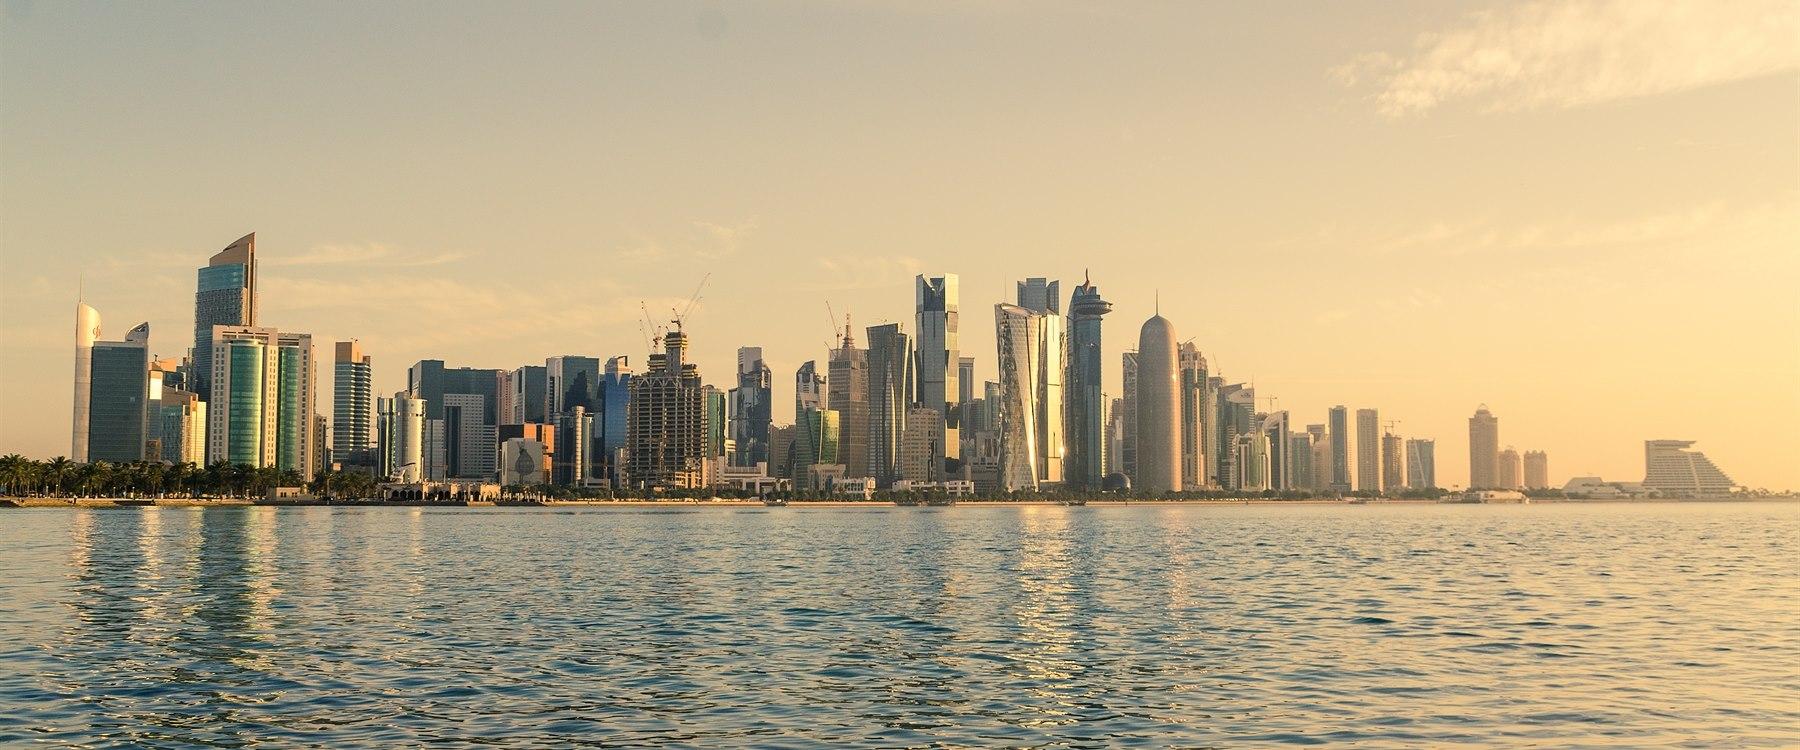 Doha Holidays - Luxury Holidays To Doha